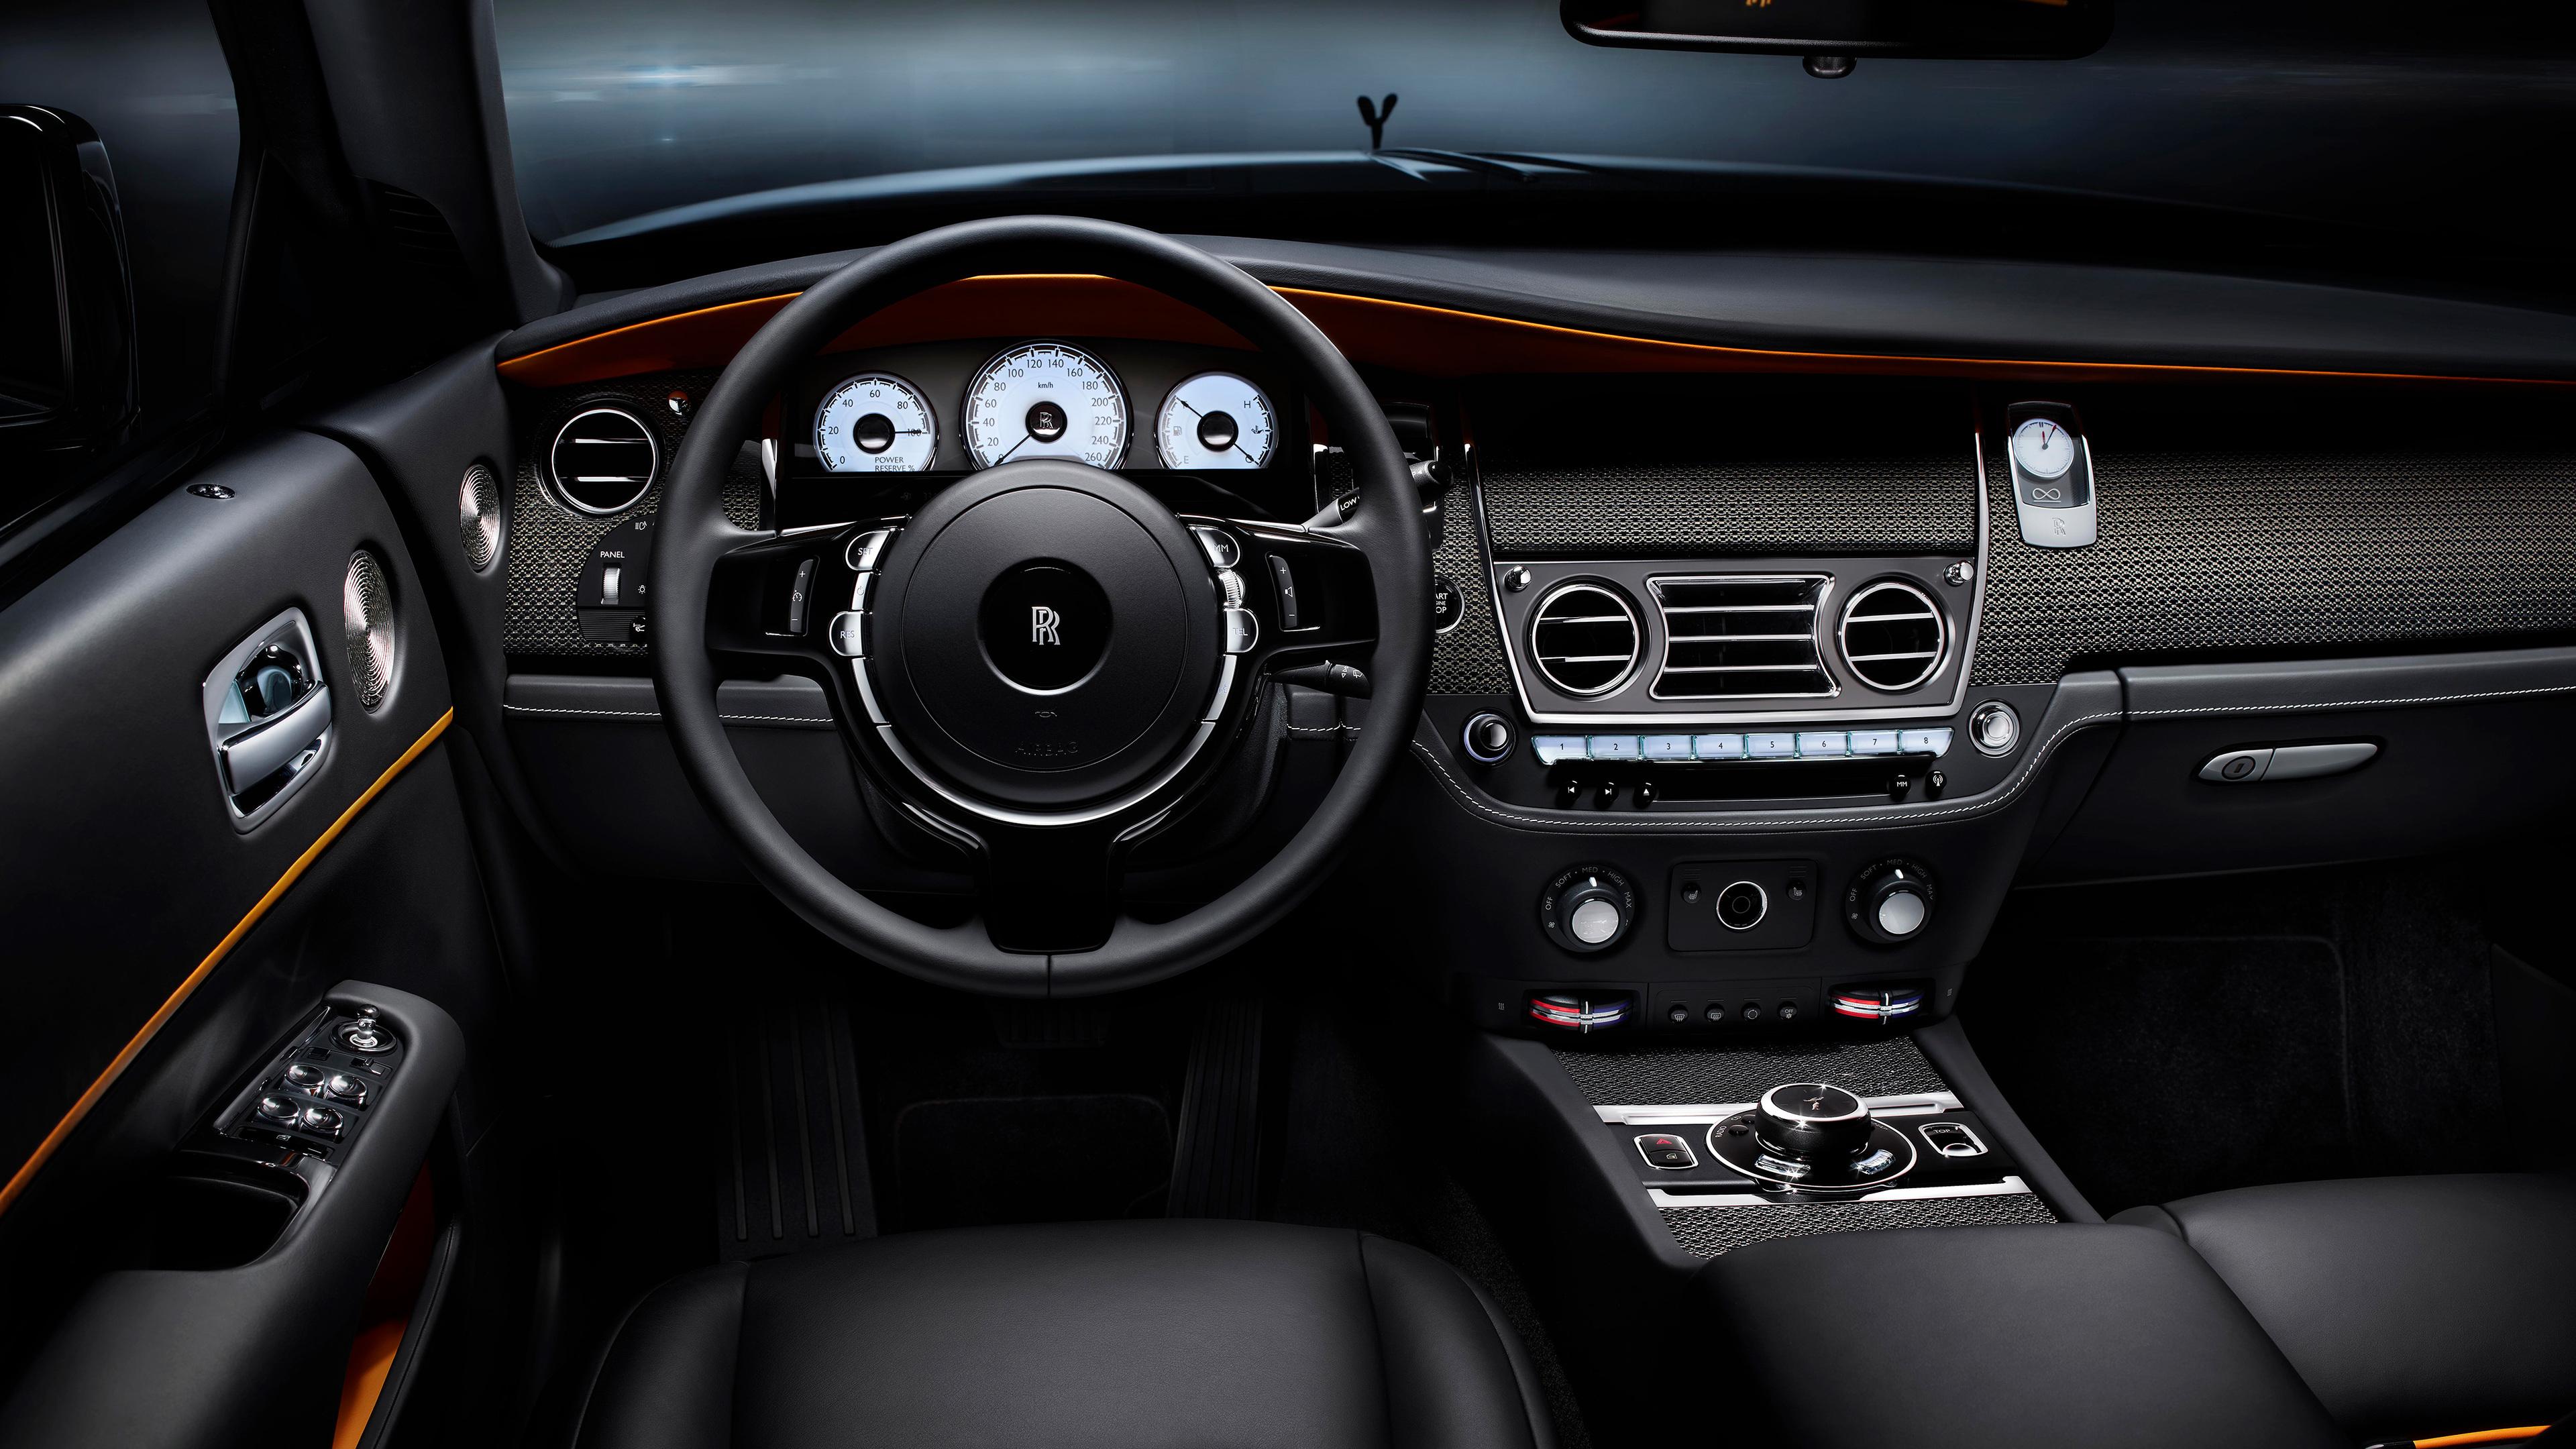 rolls royce dawn black badge interior 4k 1539105553 - Rolls Royce Dawn Black Badge Interior 4k - steering wallpapers, rolls royce wallpapers, rolls royce dawn black badge wallpapers, hd-wallpapers, 4k-wallpapers, 2017 cars wallpapers